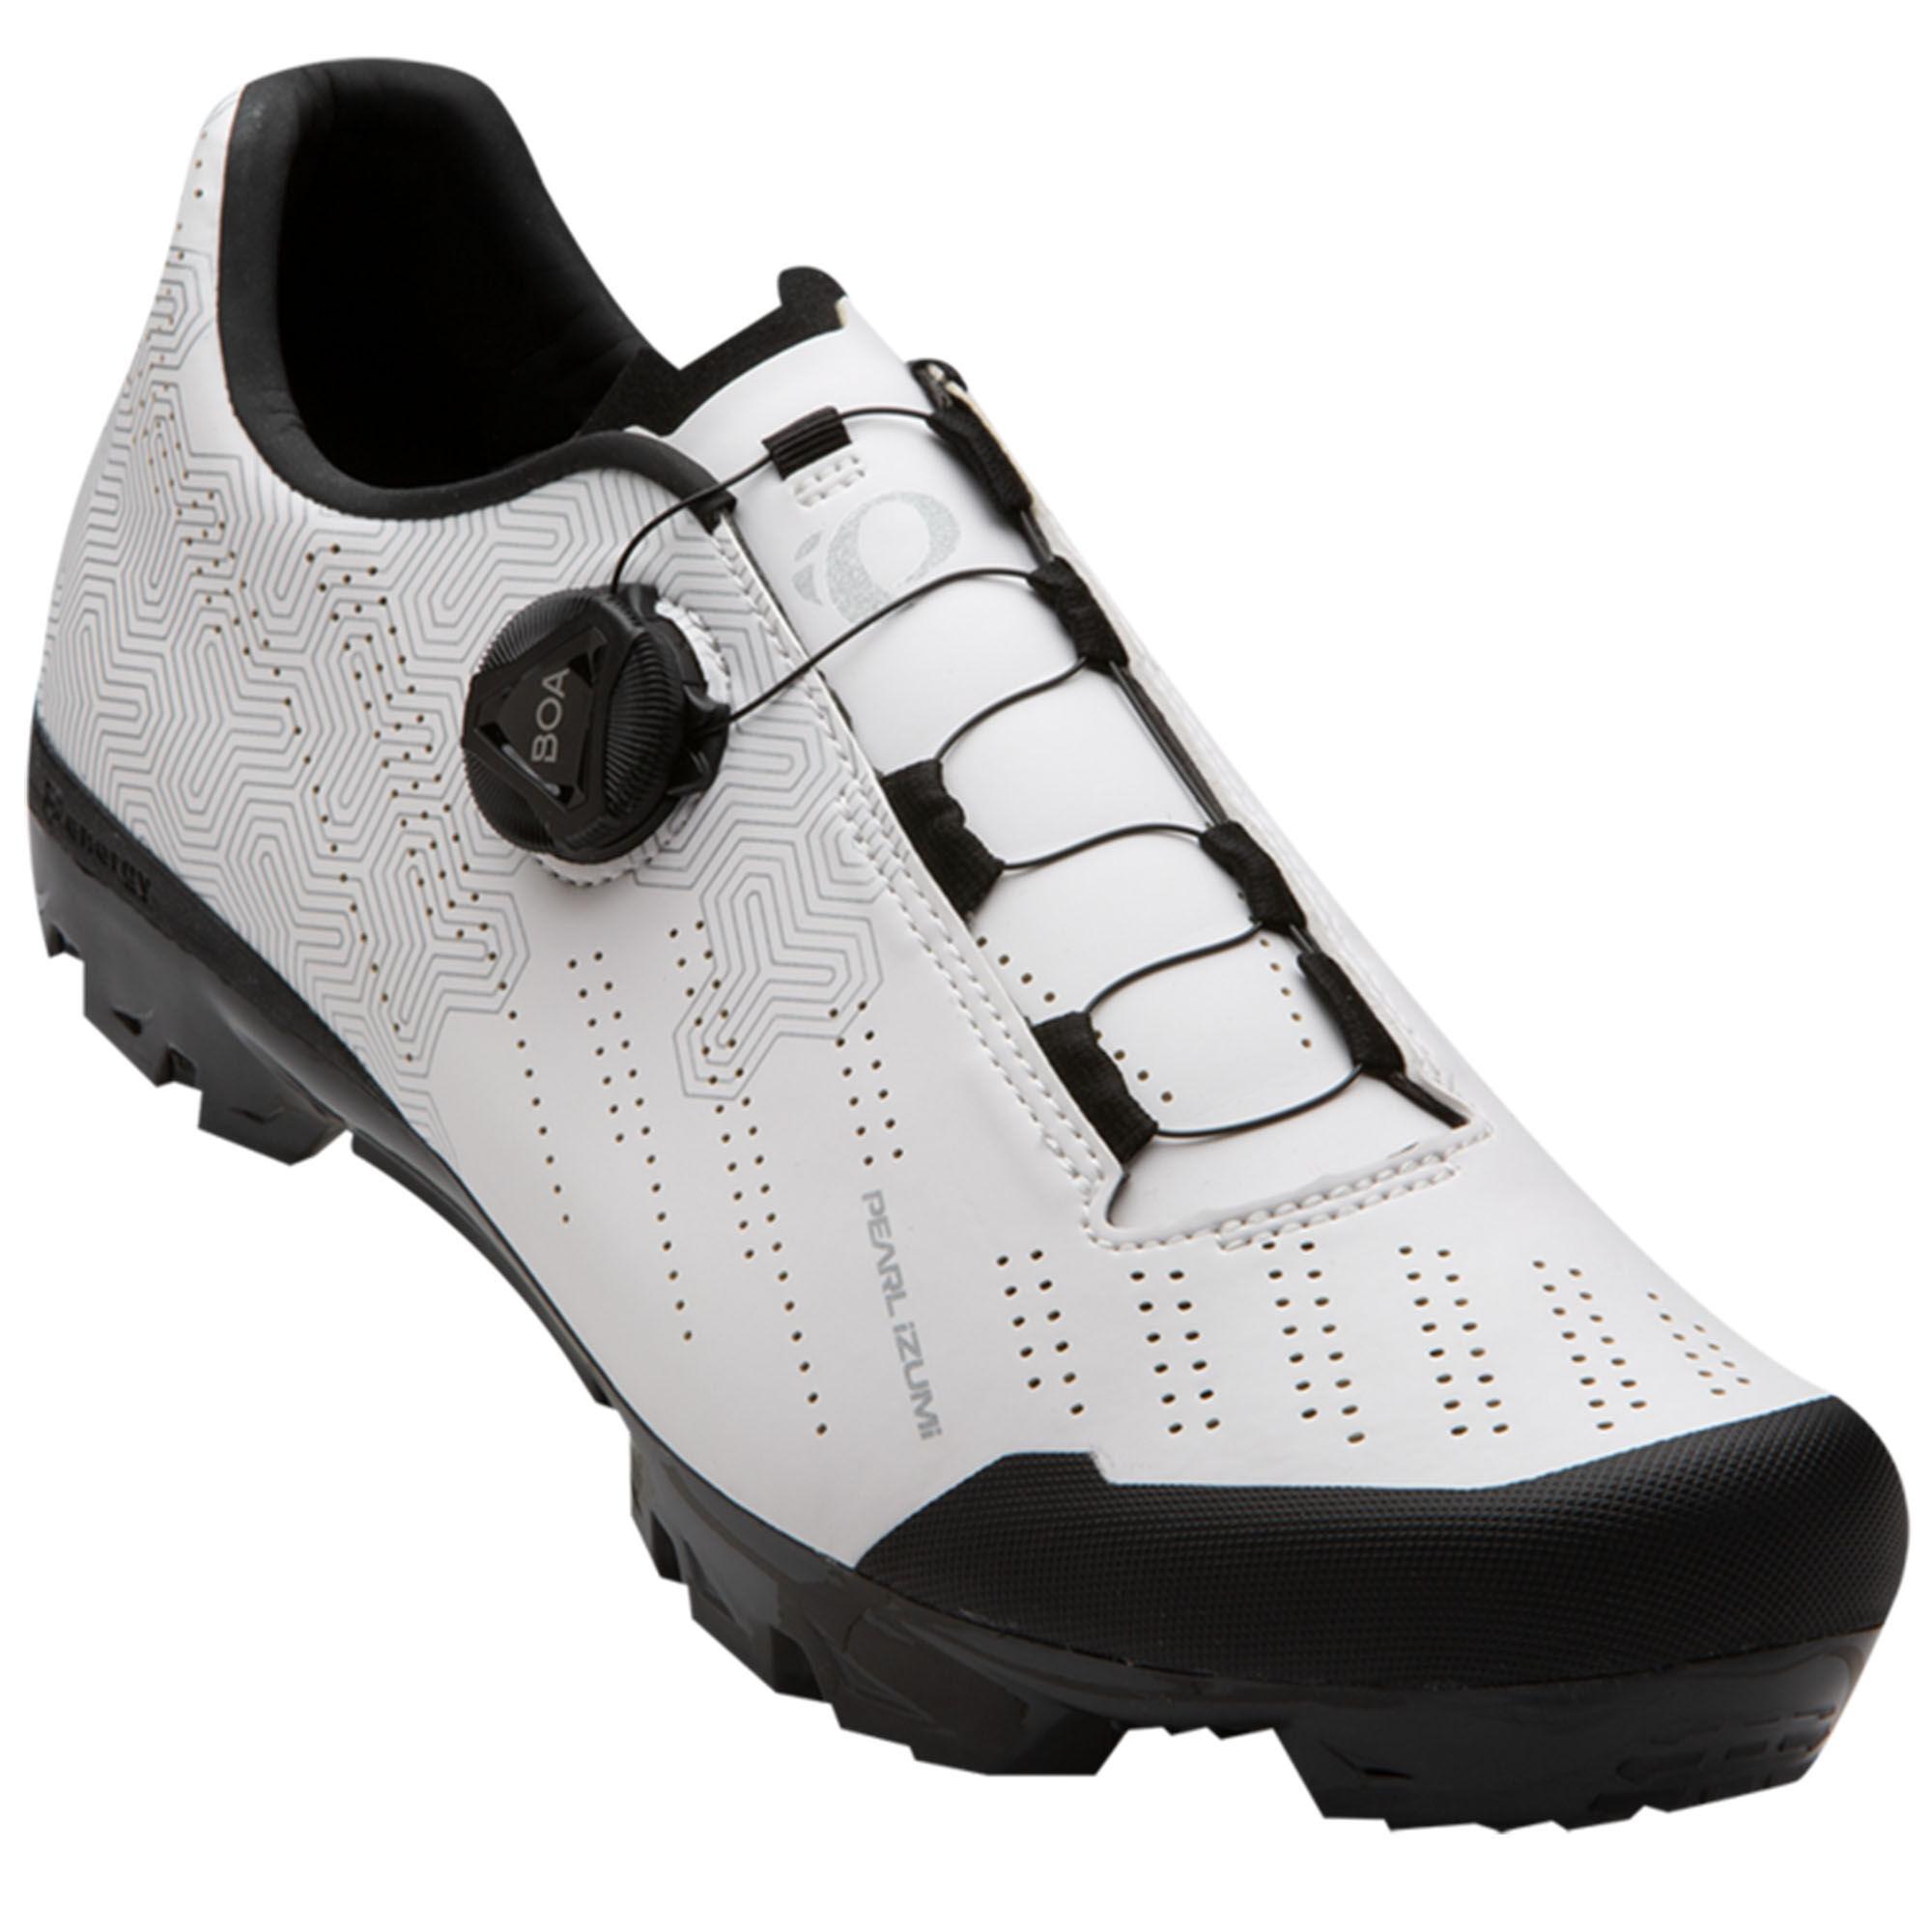 Pearl Izumi Men's X-Alp Gravel Bike Shoes  - Black/Black - Size: 48